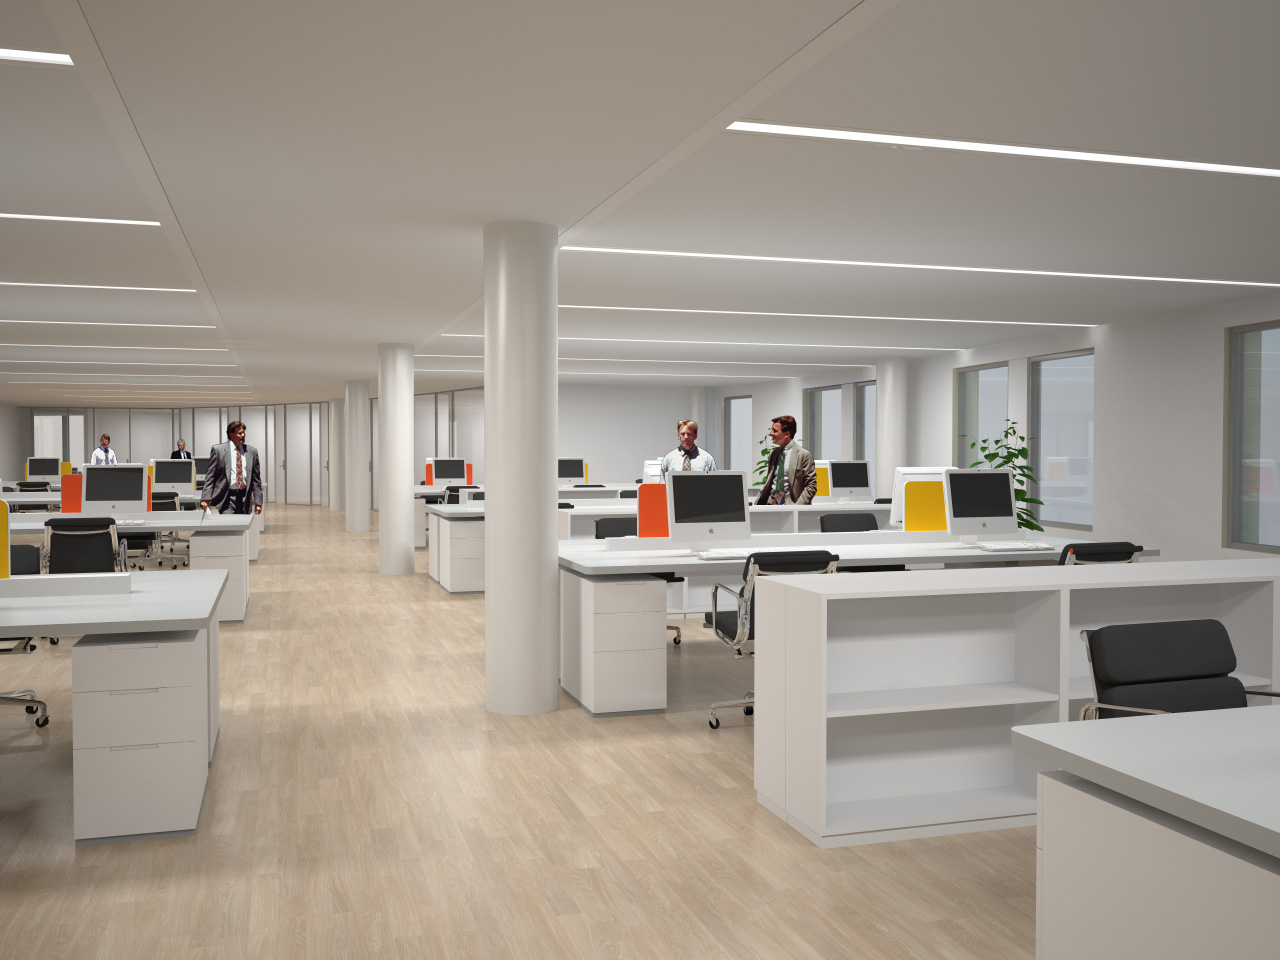 Office 02 by sirethomas